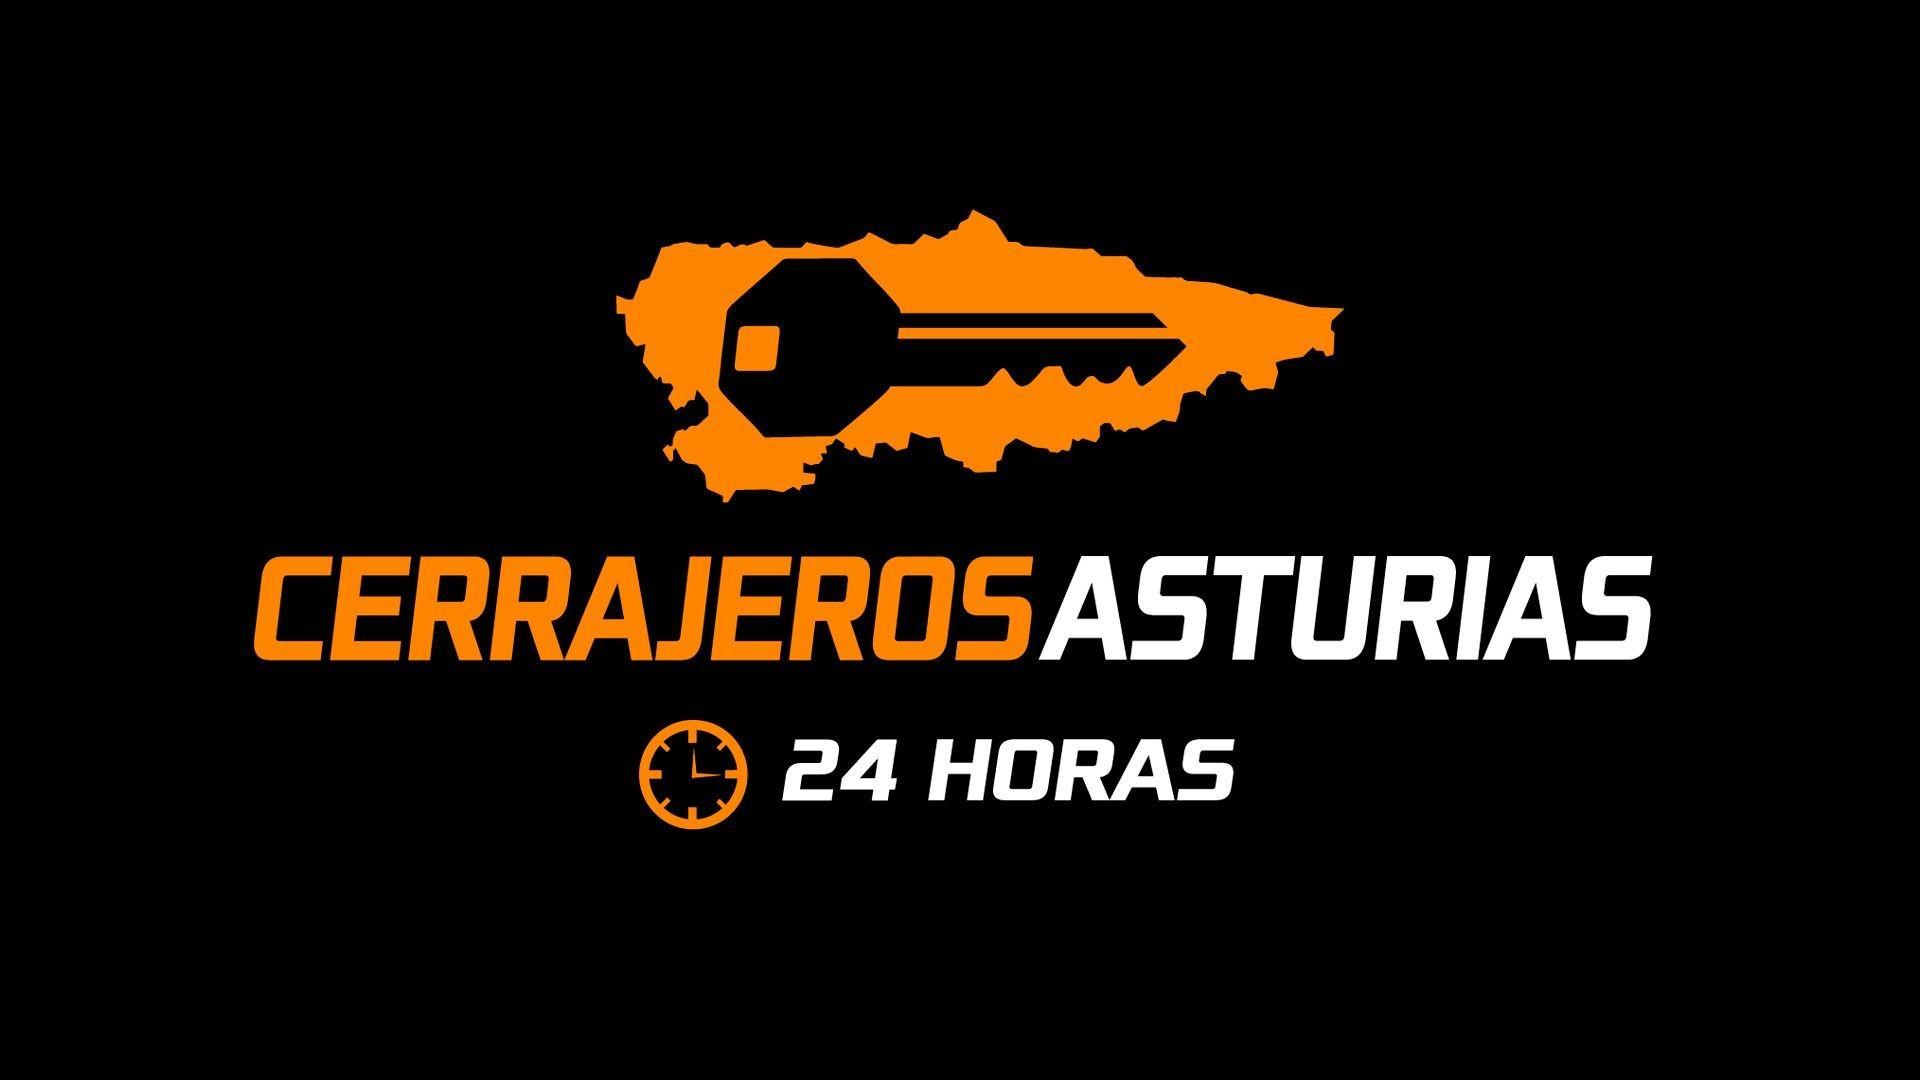 Cerrajero urgente en Asturias